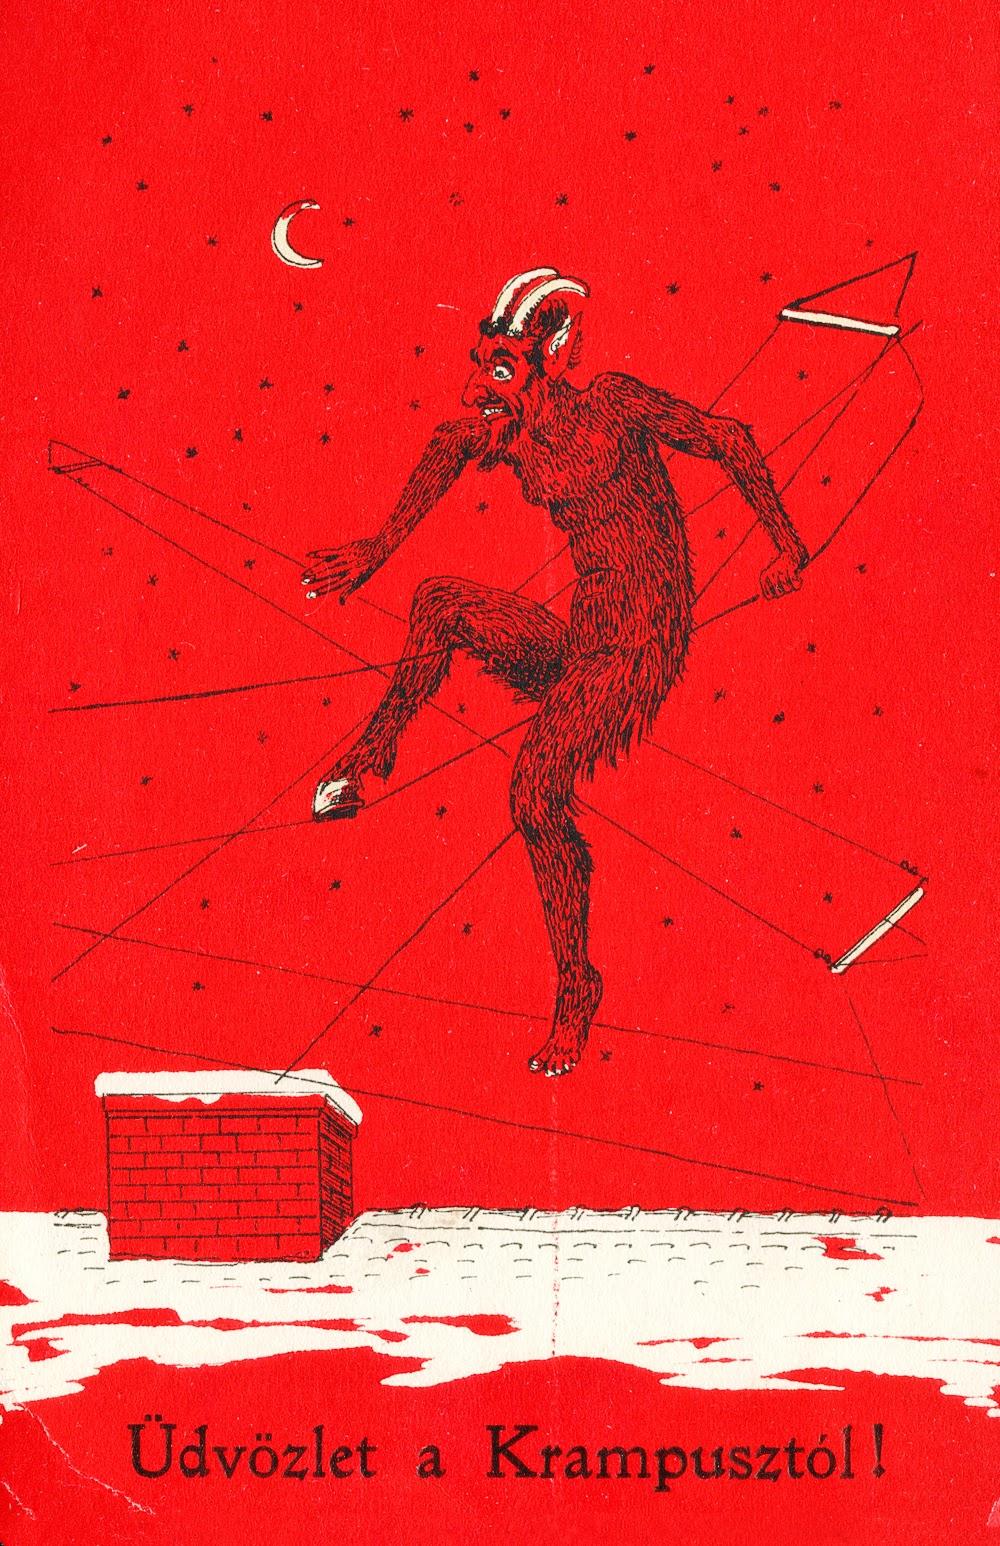 http://morbidanatomy.bigcartel.com/product/morbid-anatomy-annual-krampus-costume-party